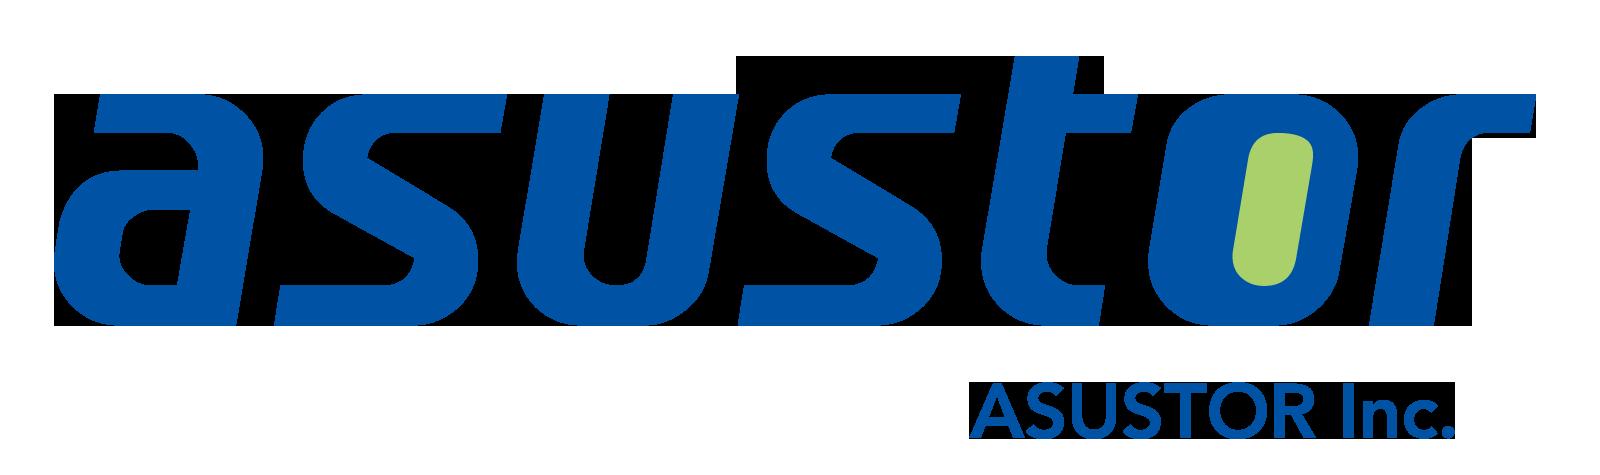 logo_asustor_1